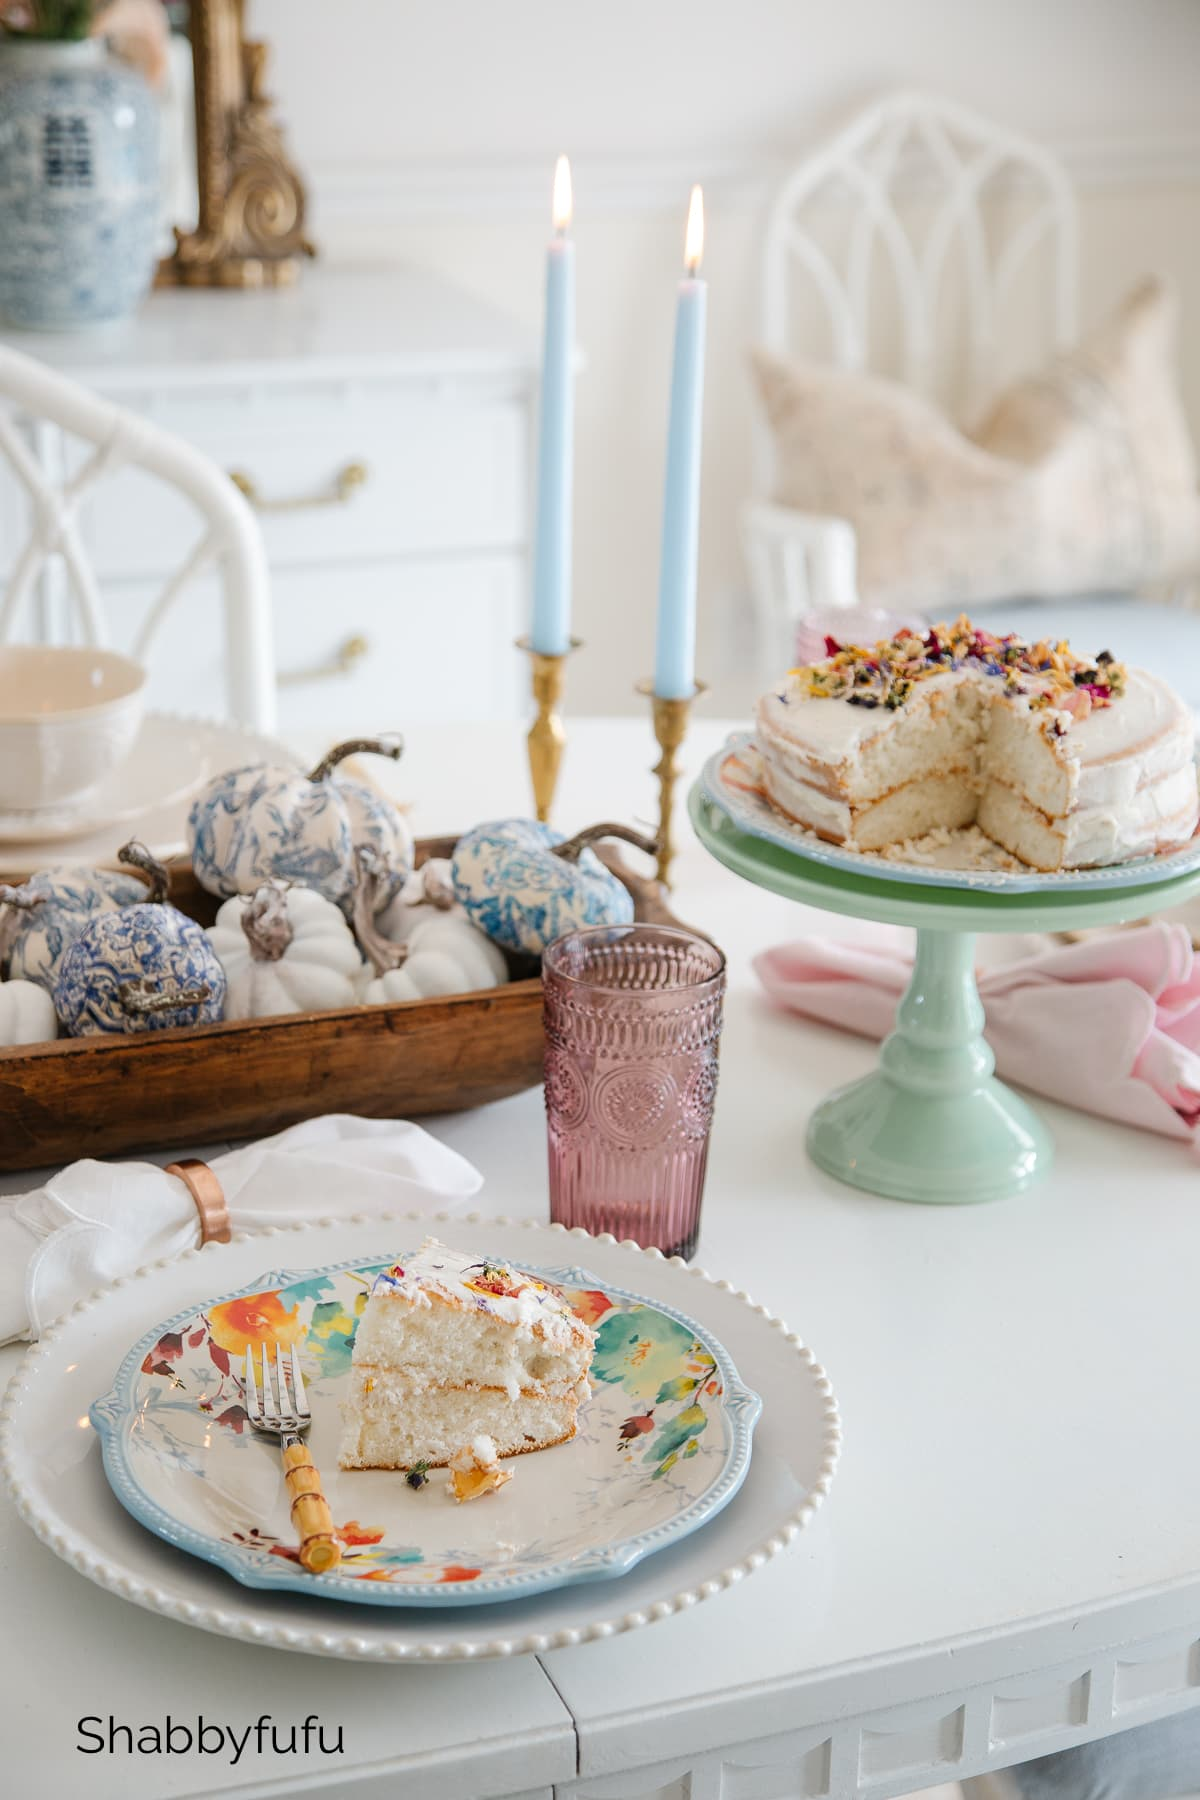 cake with edible flowers fall table setting shabbyfufu